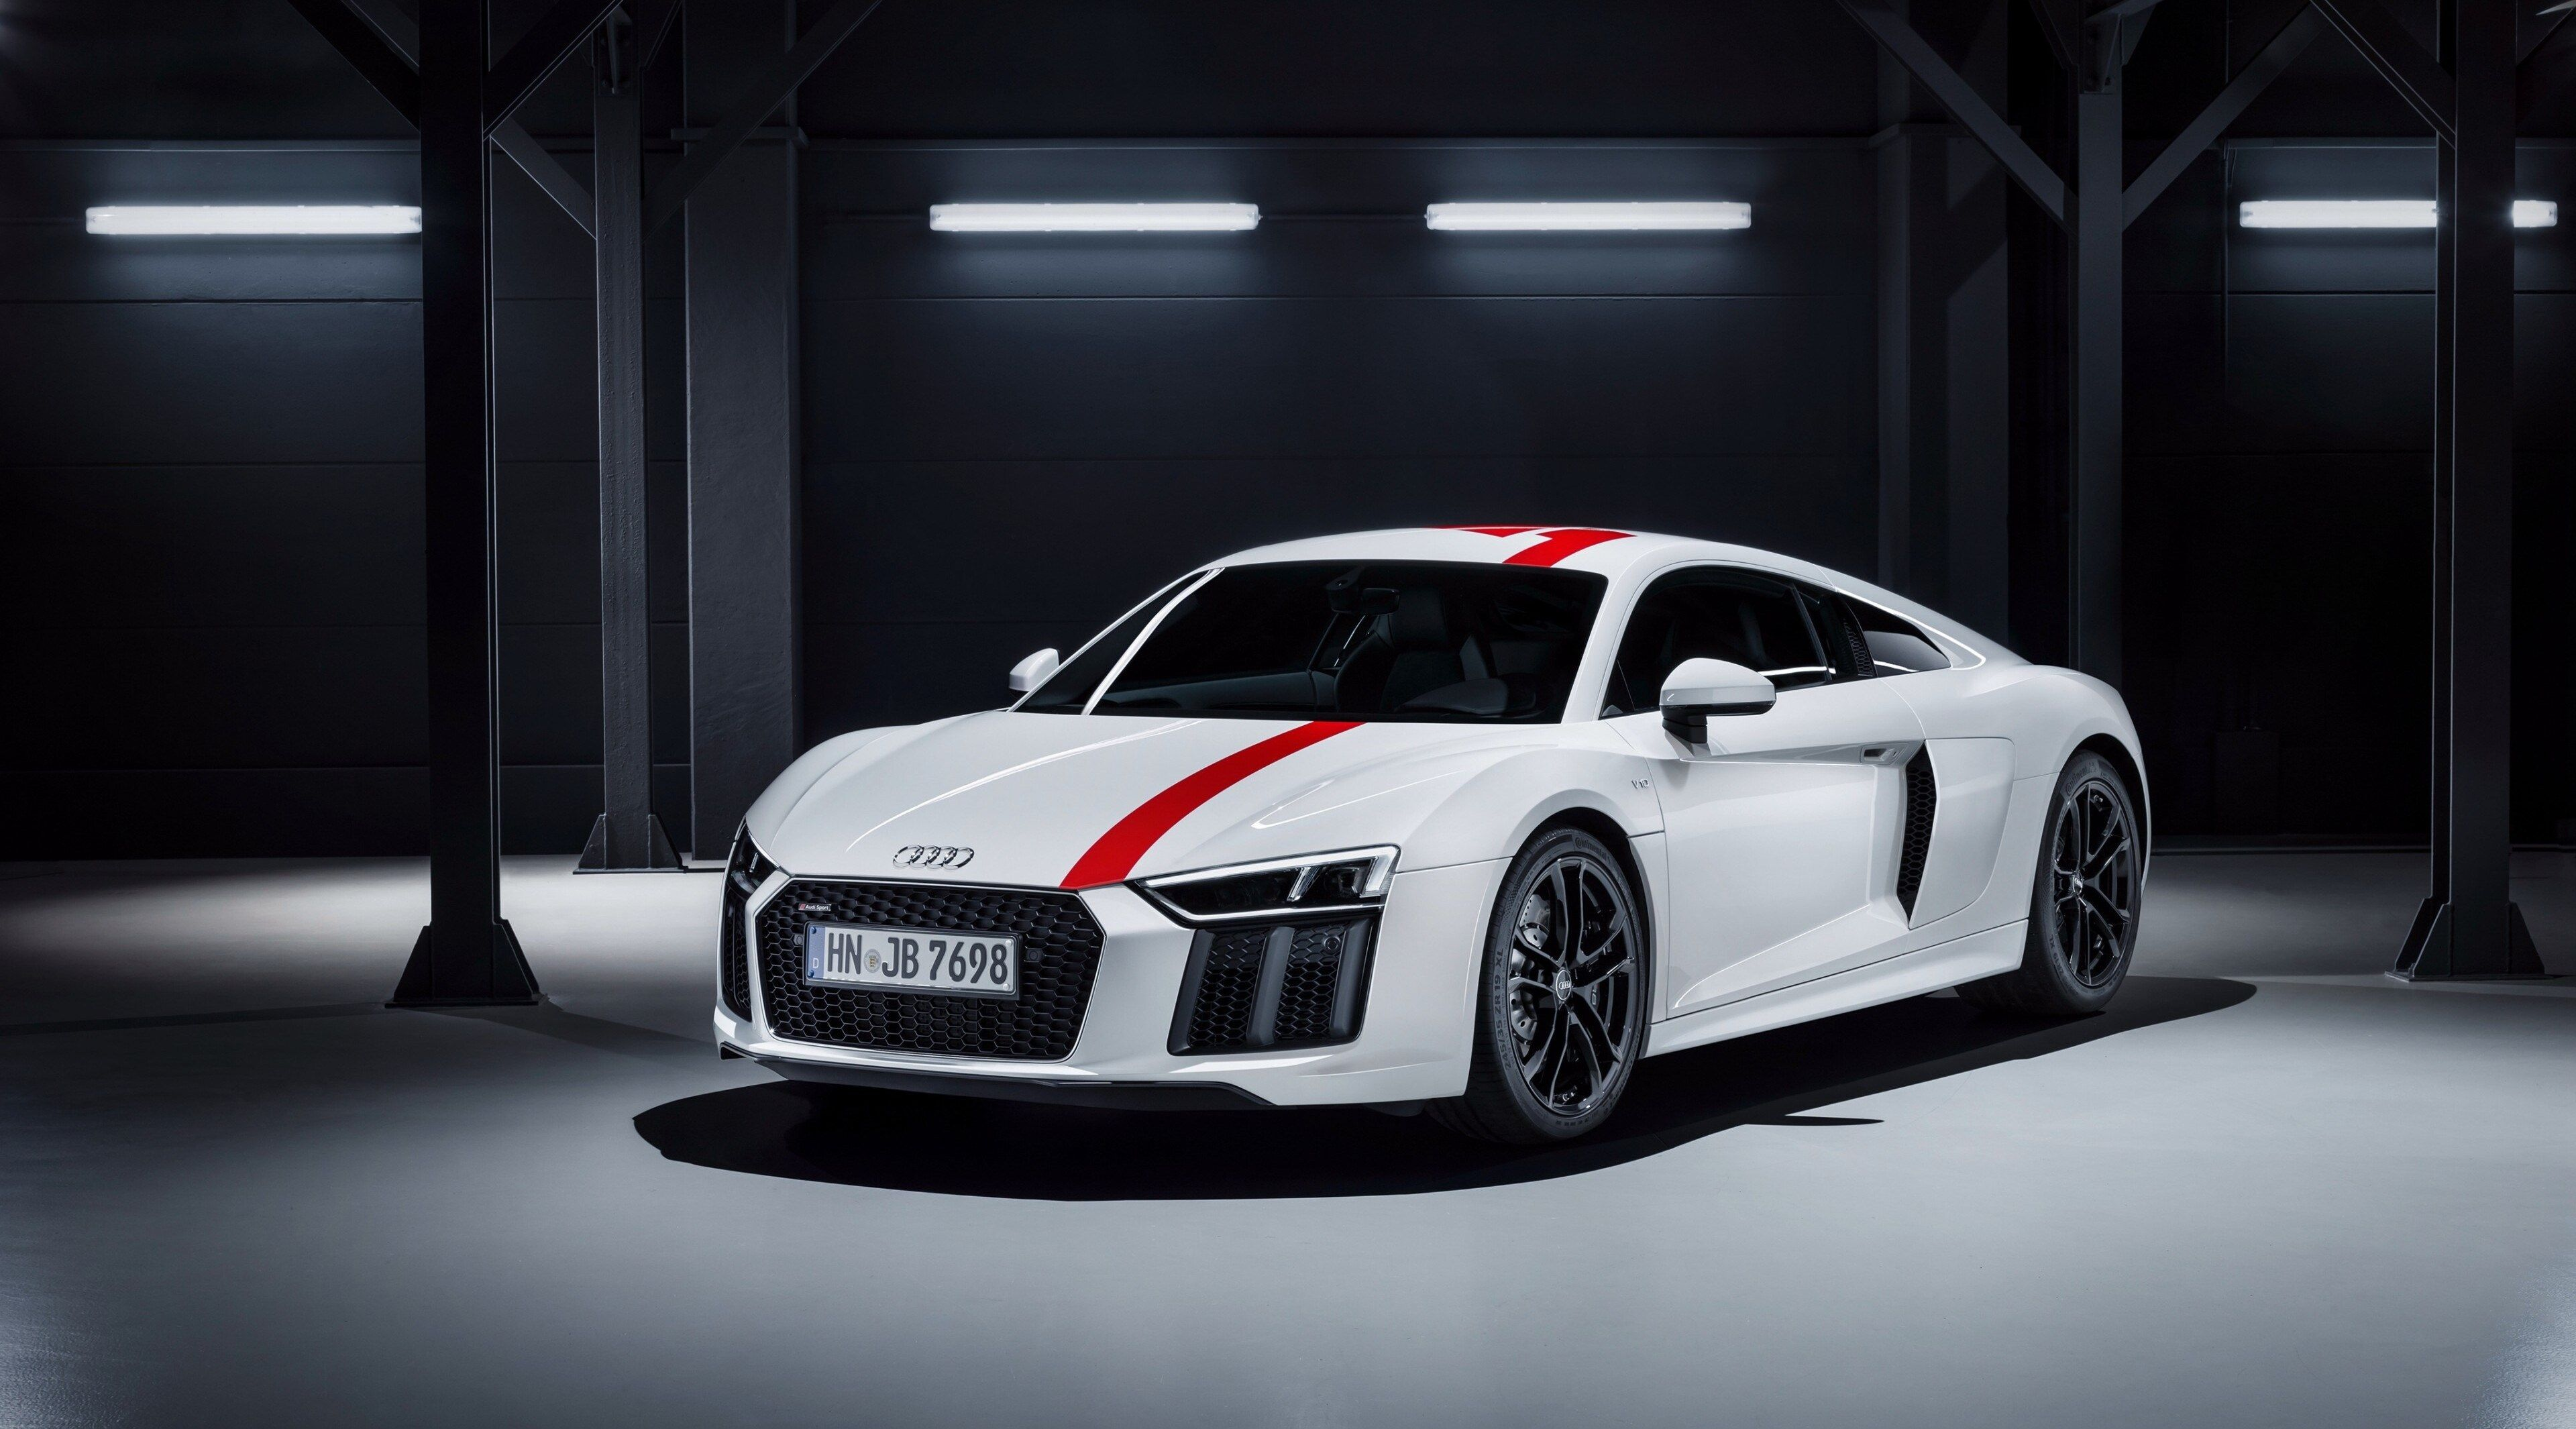 3840x2130 Audi R8 V10 Rws 4k Hd Free Wallpaper Vs